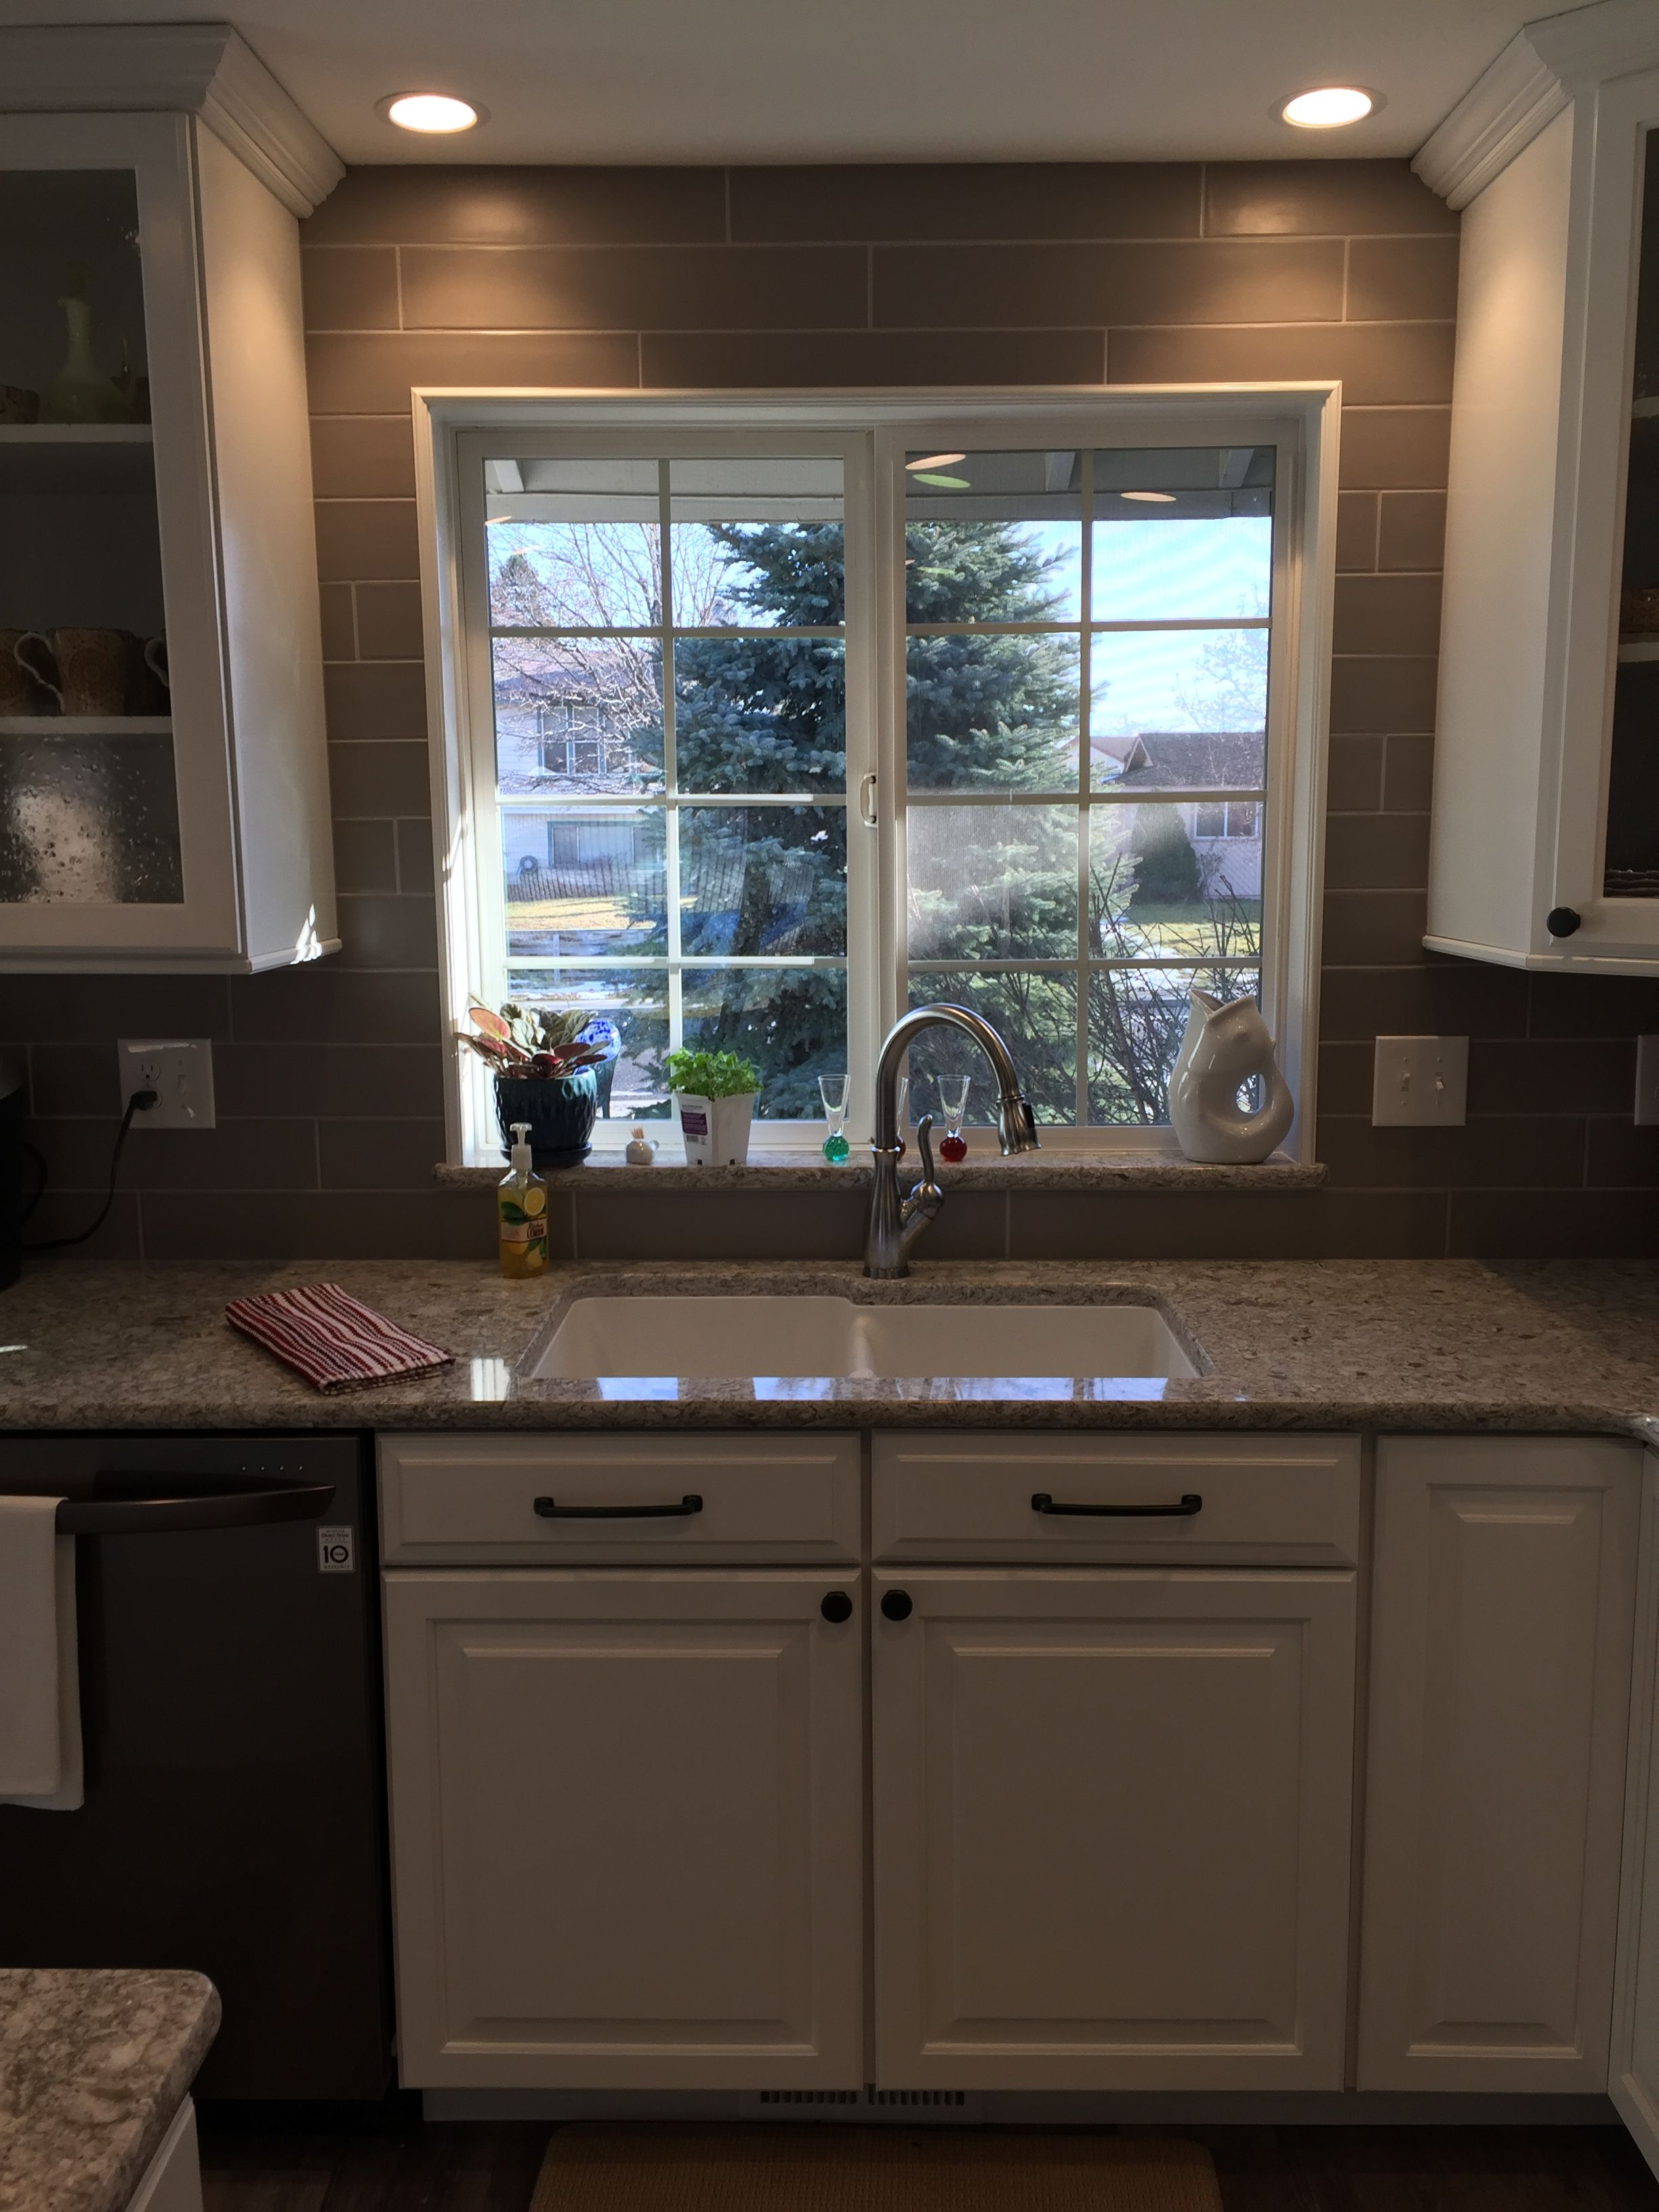 Full Height Backsplash 4 X 12 Subway Tile Cambria Quartz Countertops Kitchen Peninsula Cambria Quartz Countertops Kitchen Renovation